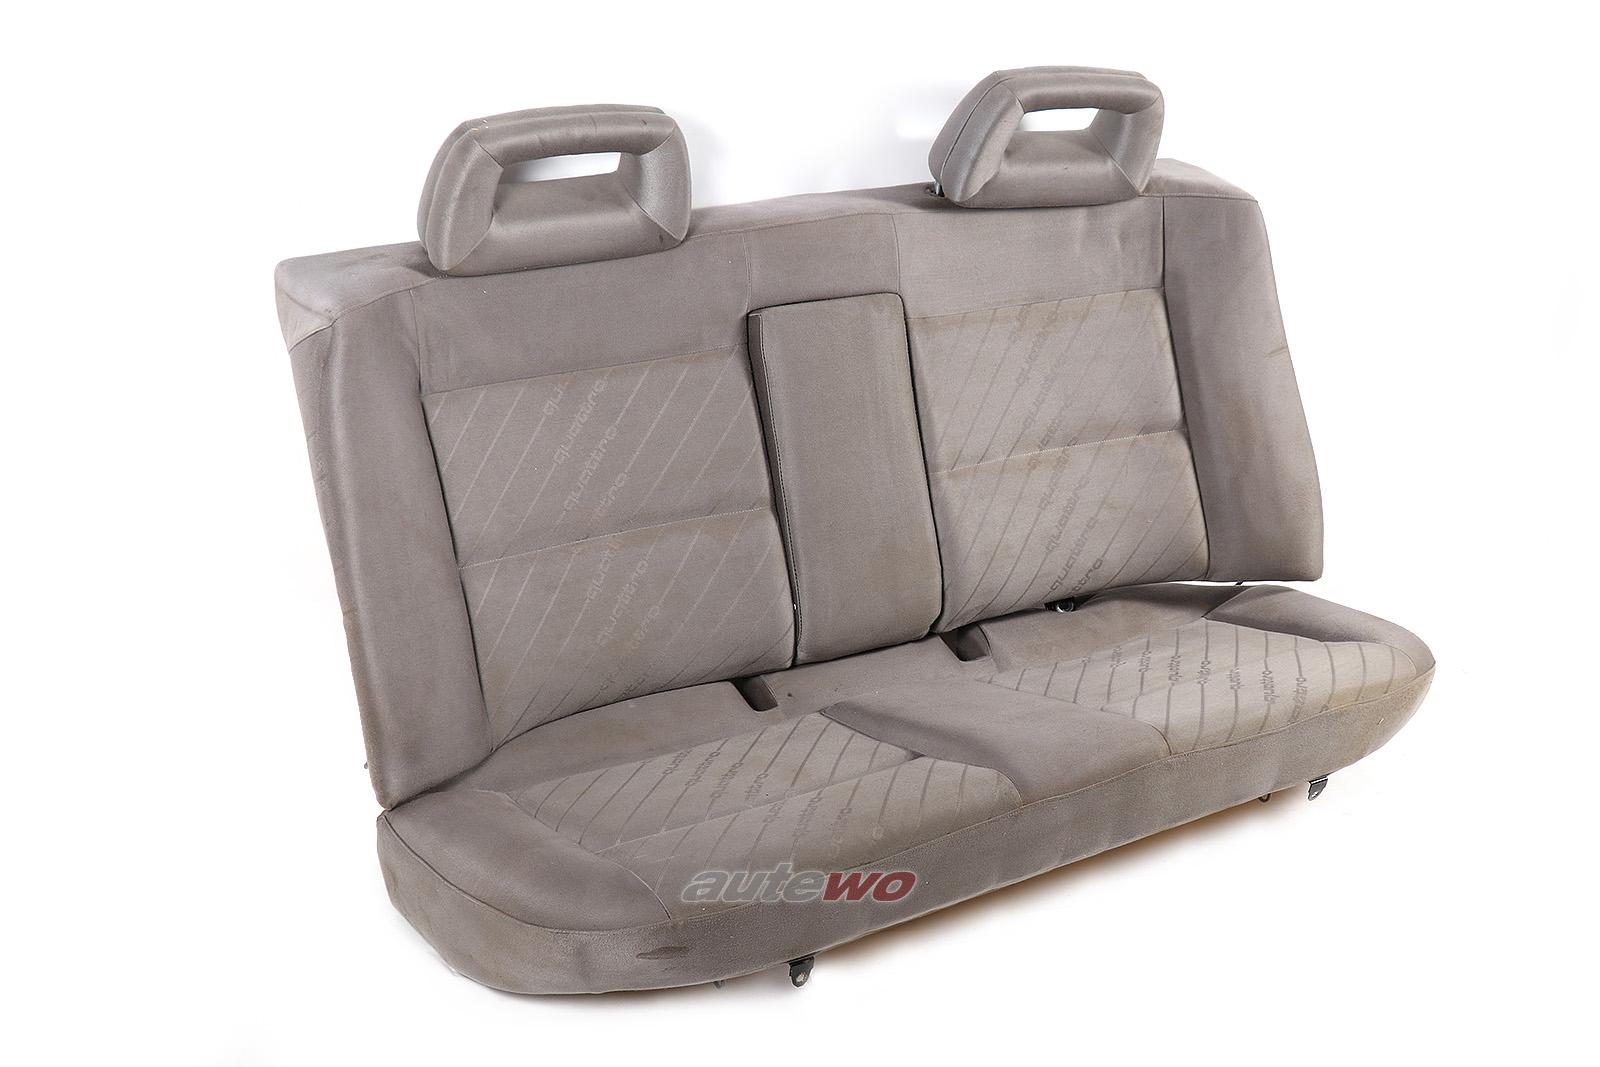 Audi 100/S4 C4 Limousine Rücksitzbank Quattro-Satin platin Sitzheizung hinten